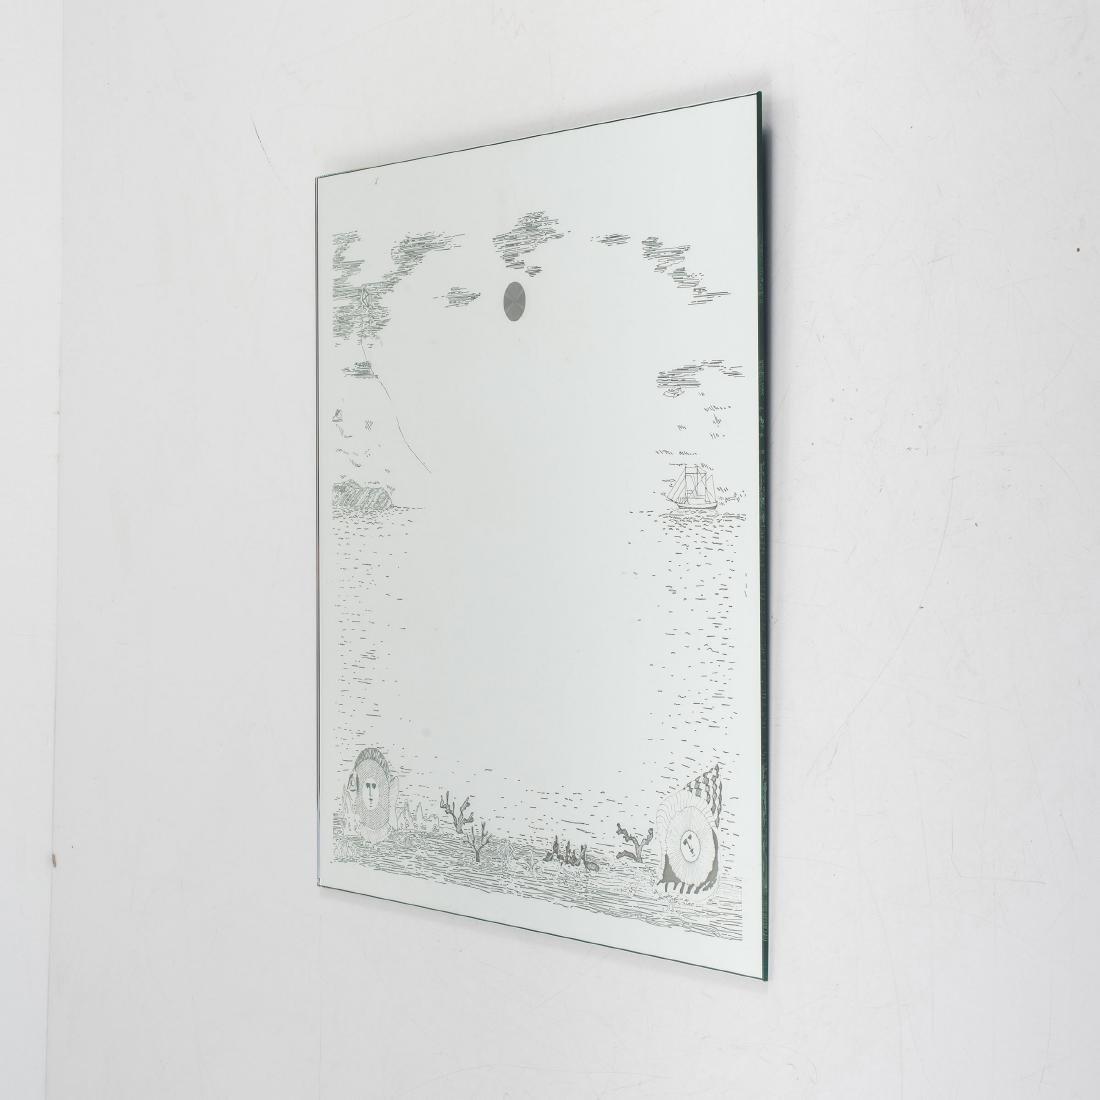 Illuminated 'Fondo Marino' mirror, 2000s - 2